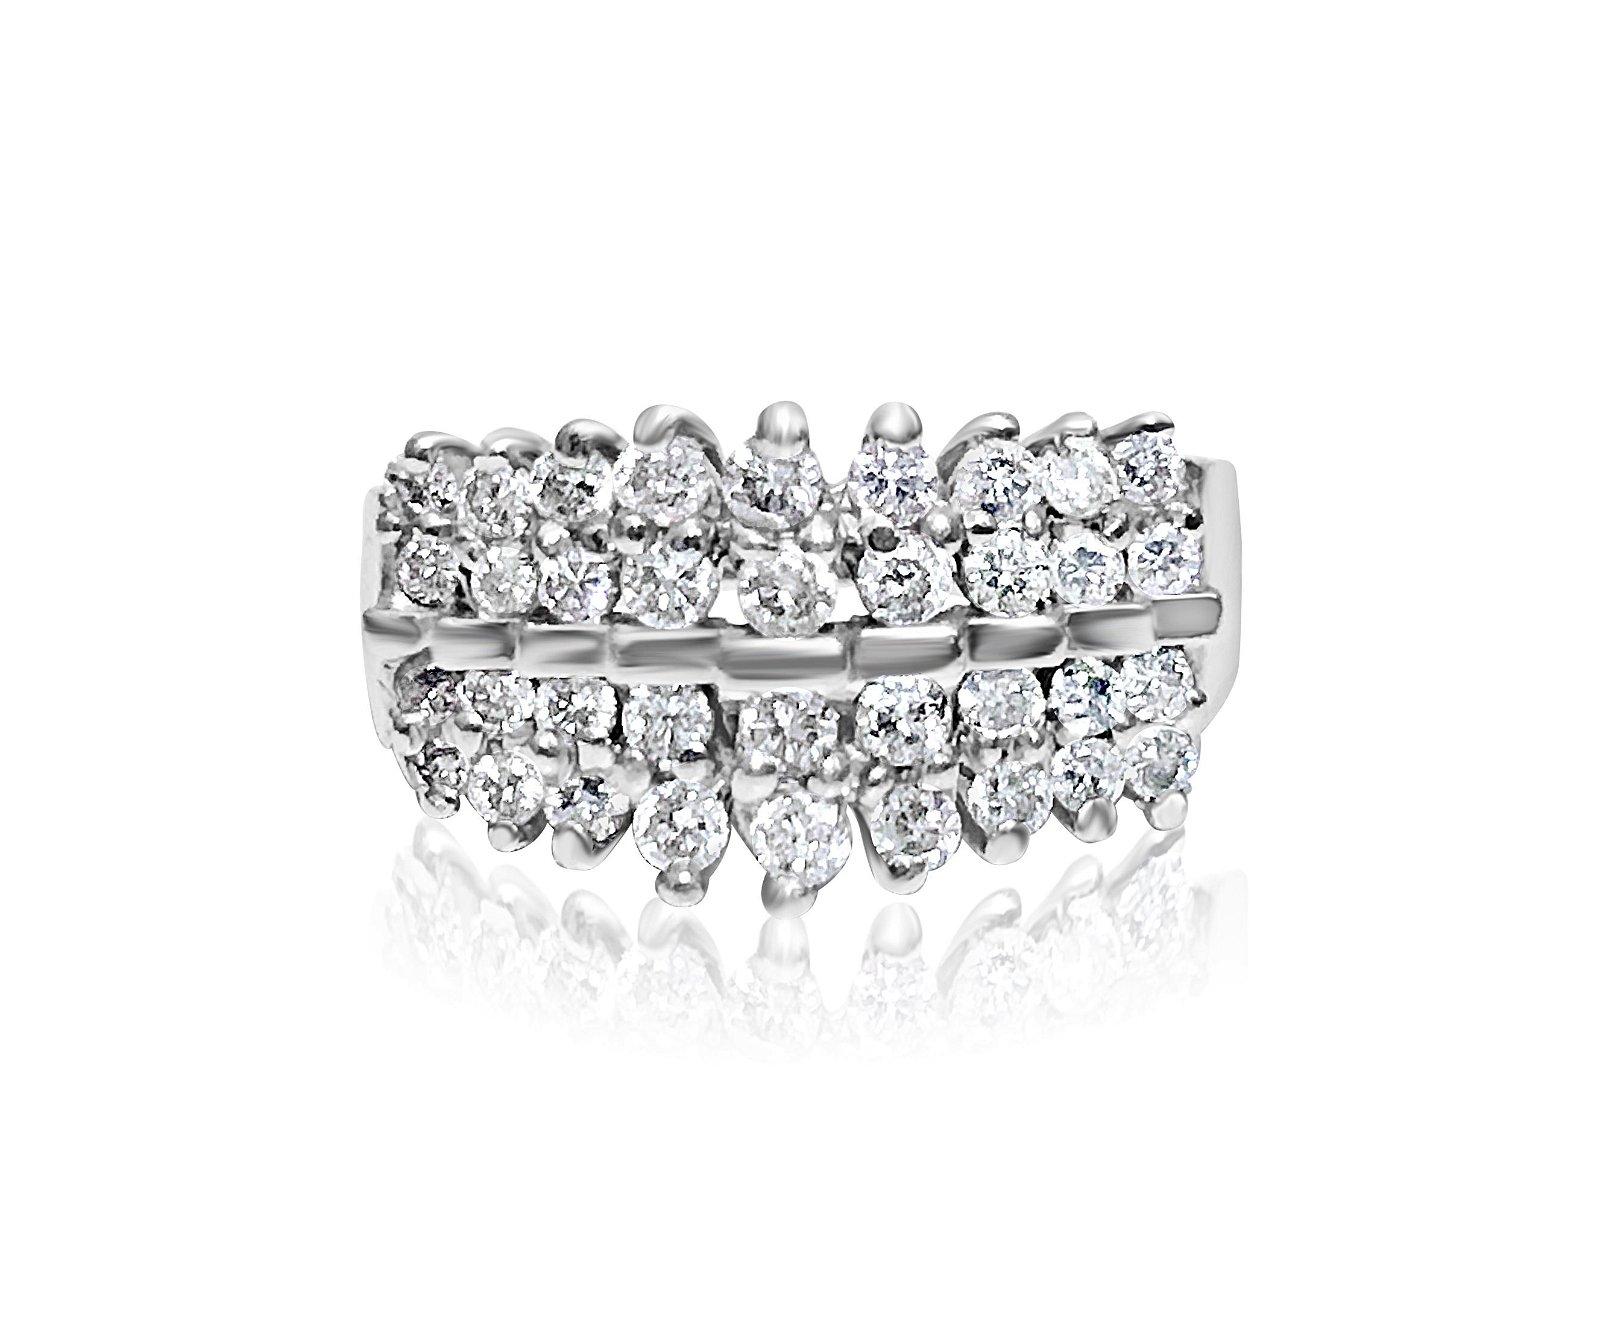 14K White Gold, 1.00 carat VS/G Diamond Cocktail Ring